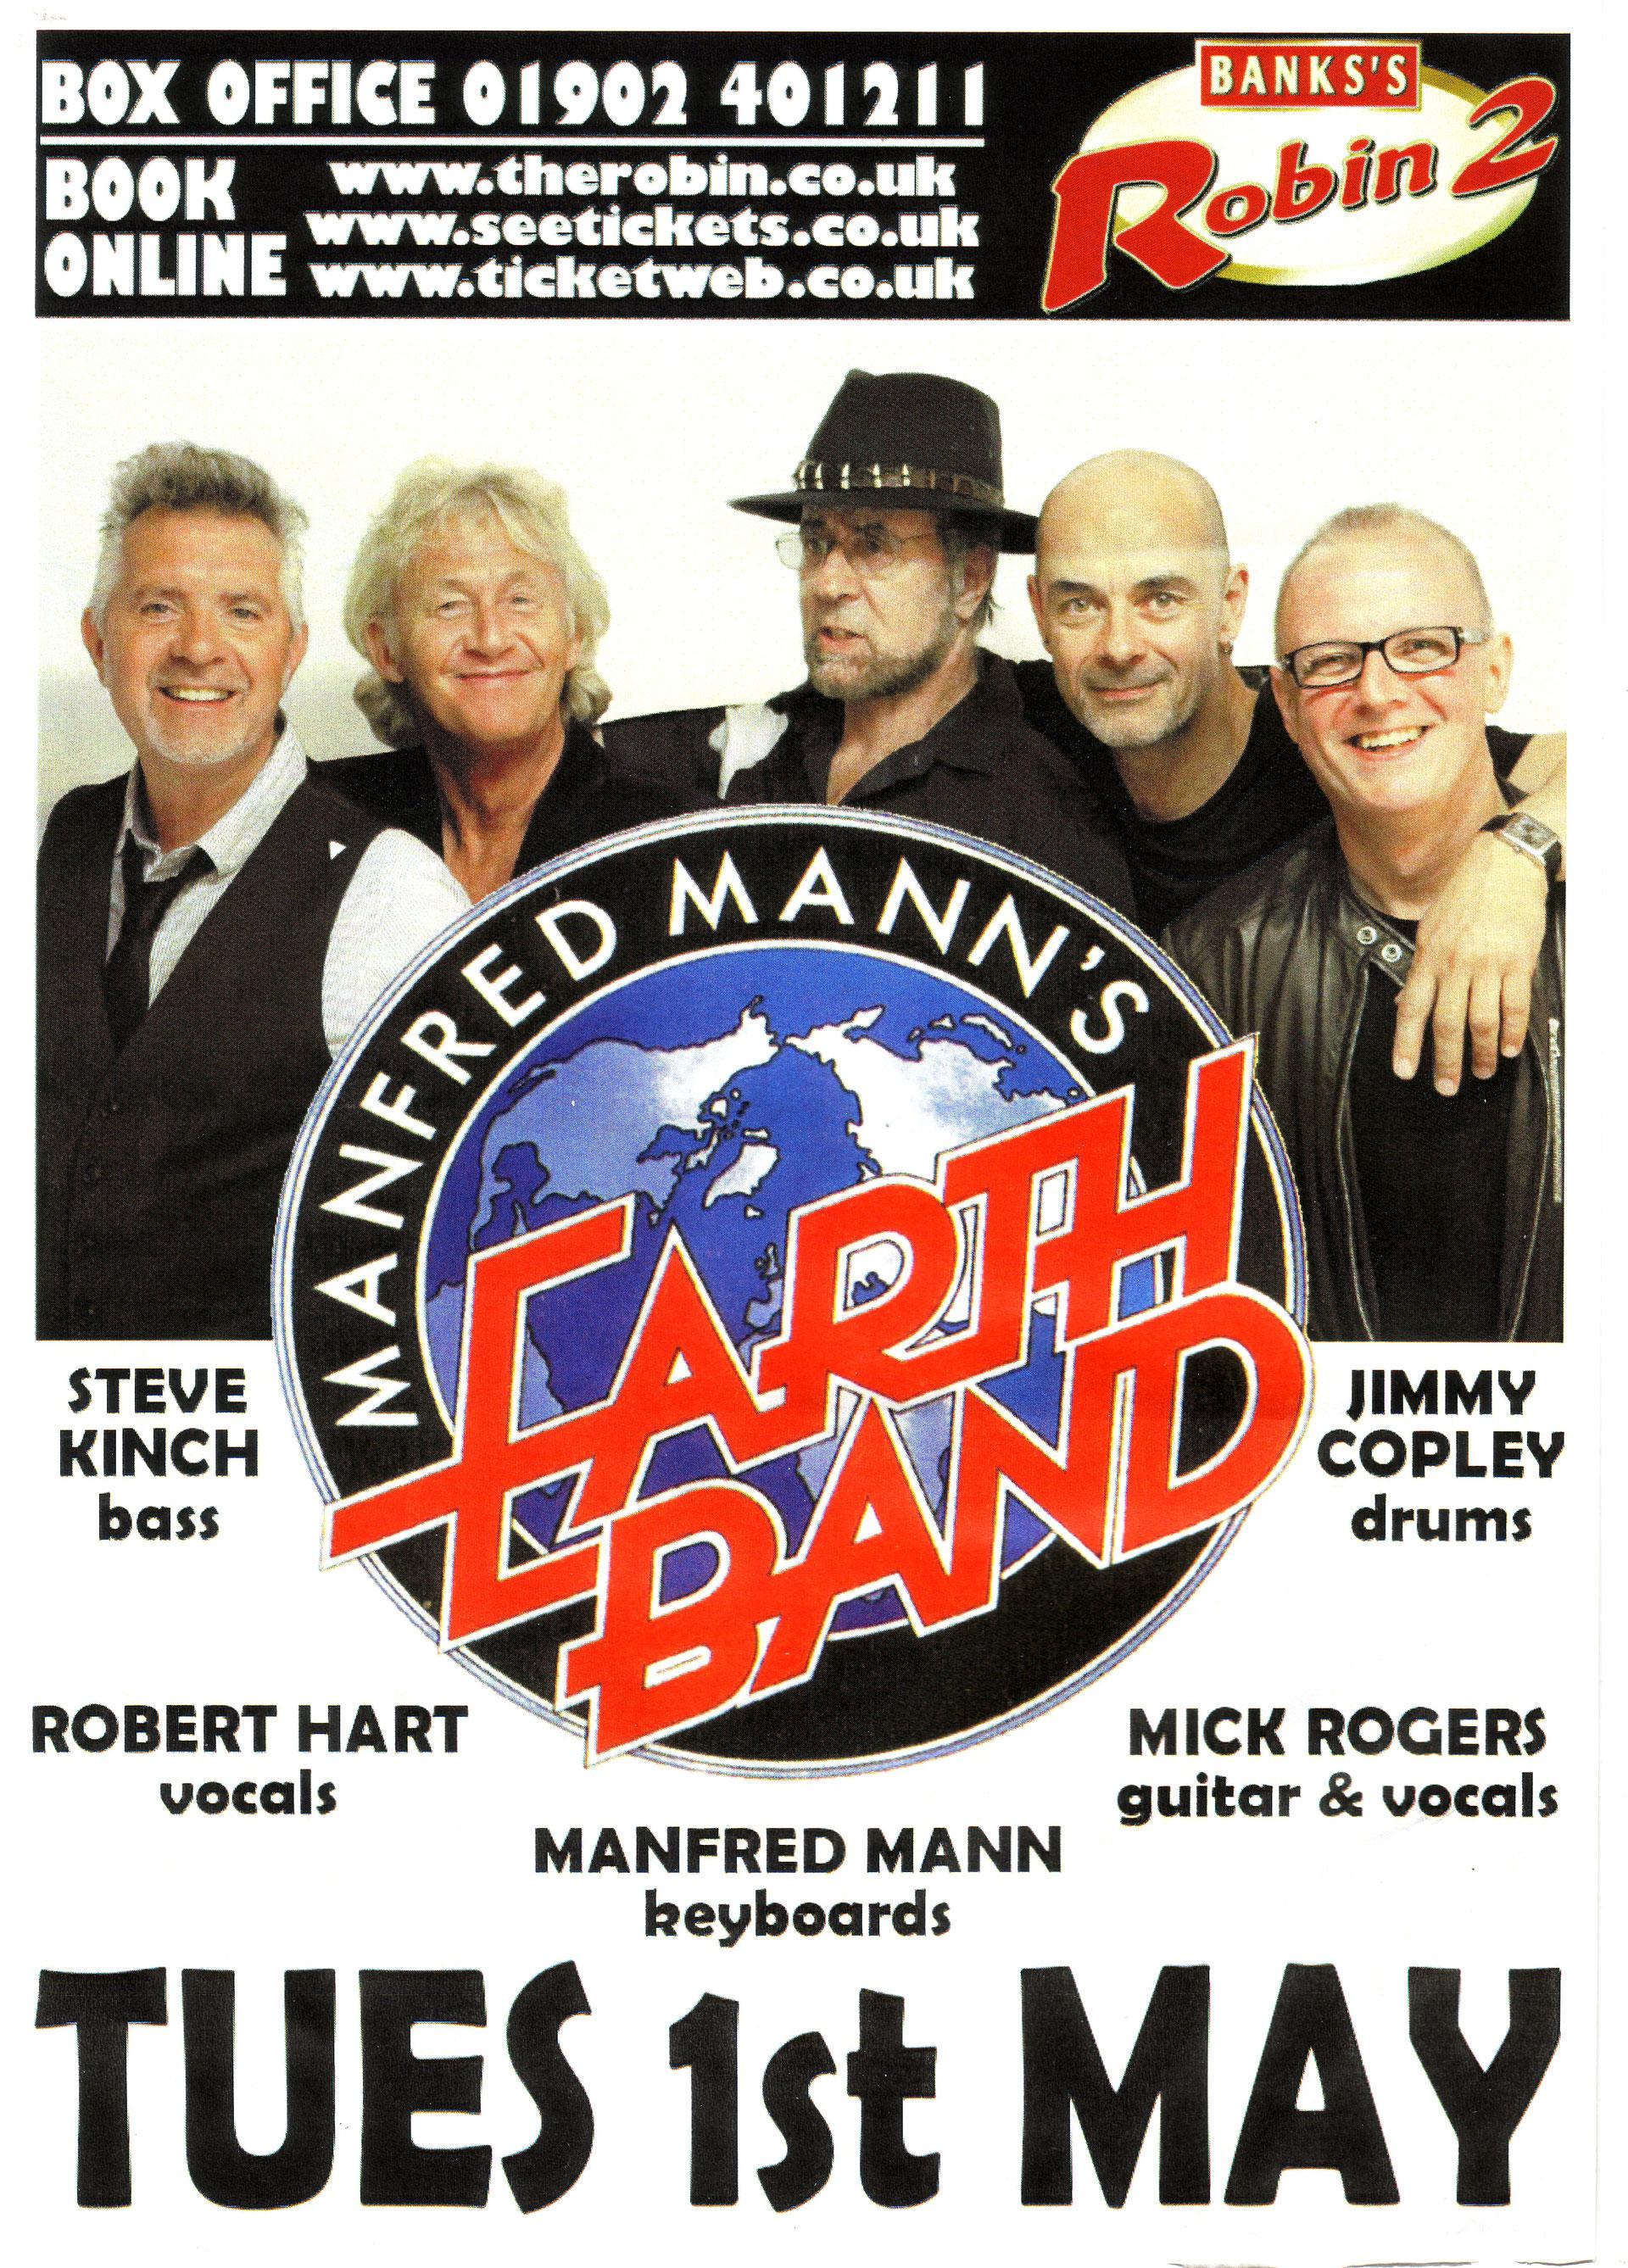 manfred mann tour dates)